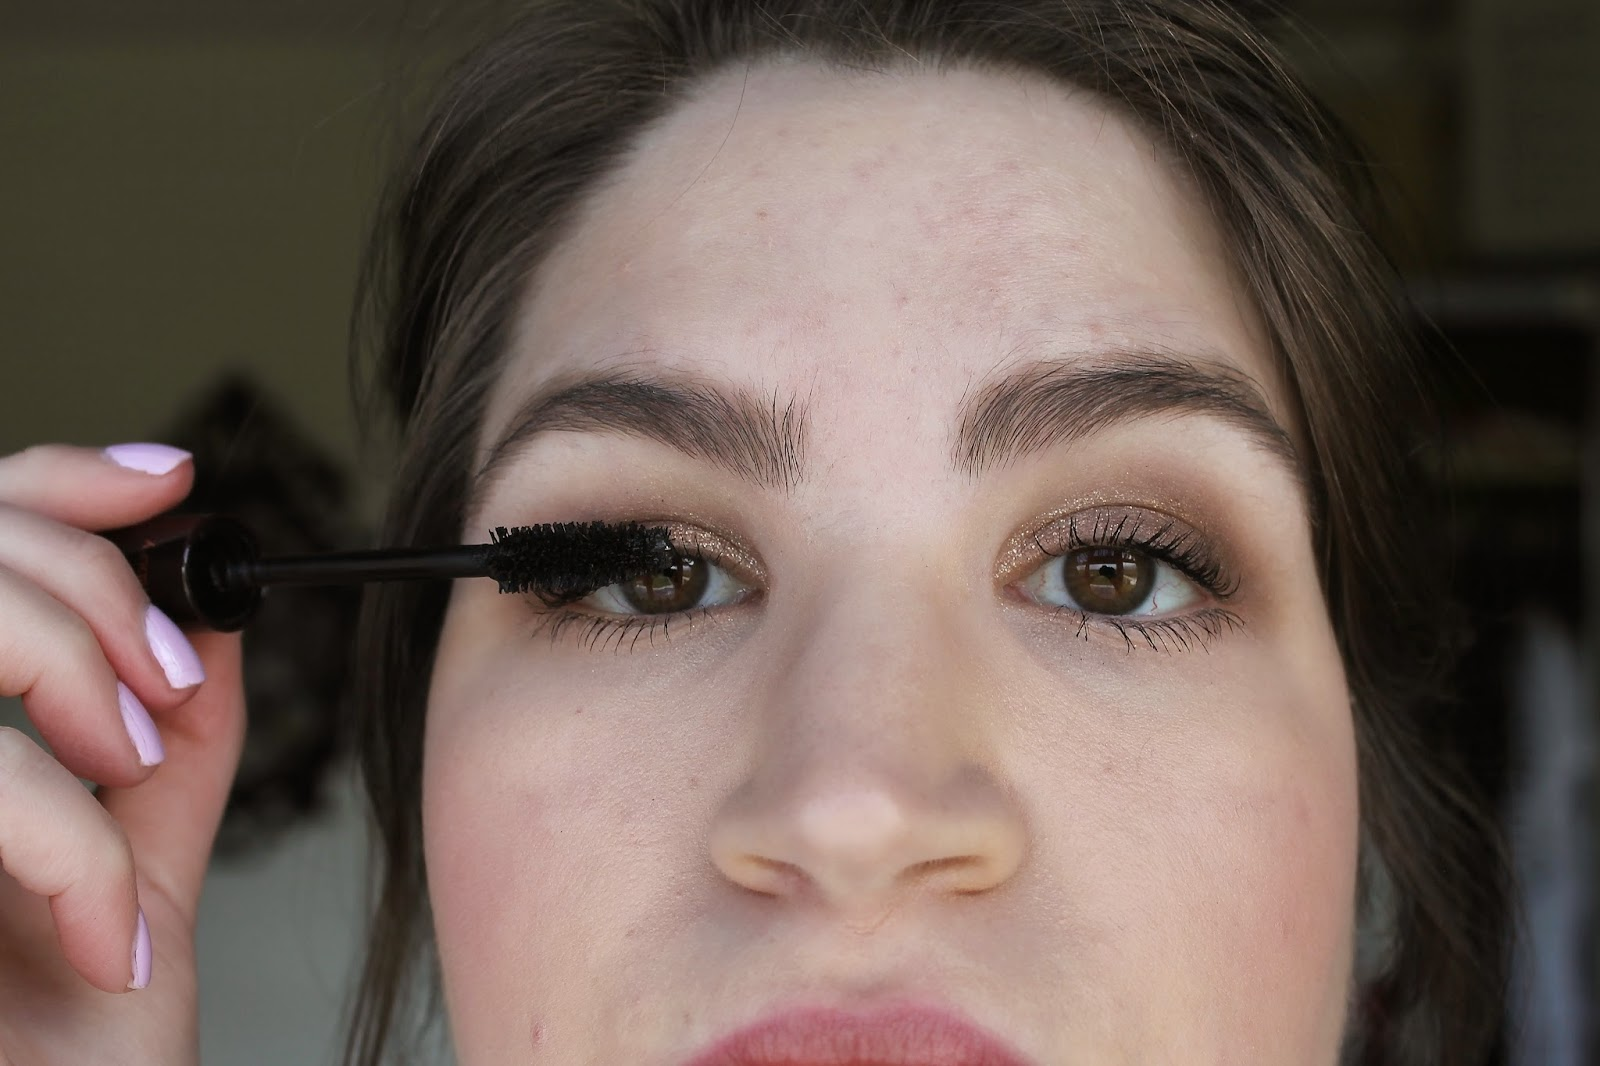 Charlotte Tilbury Full Fat Lashes Mascara